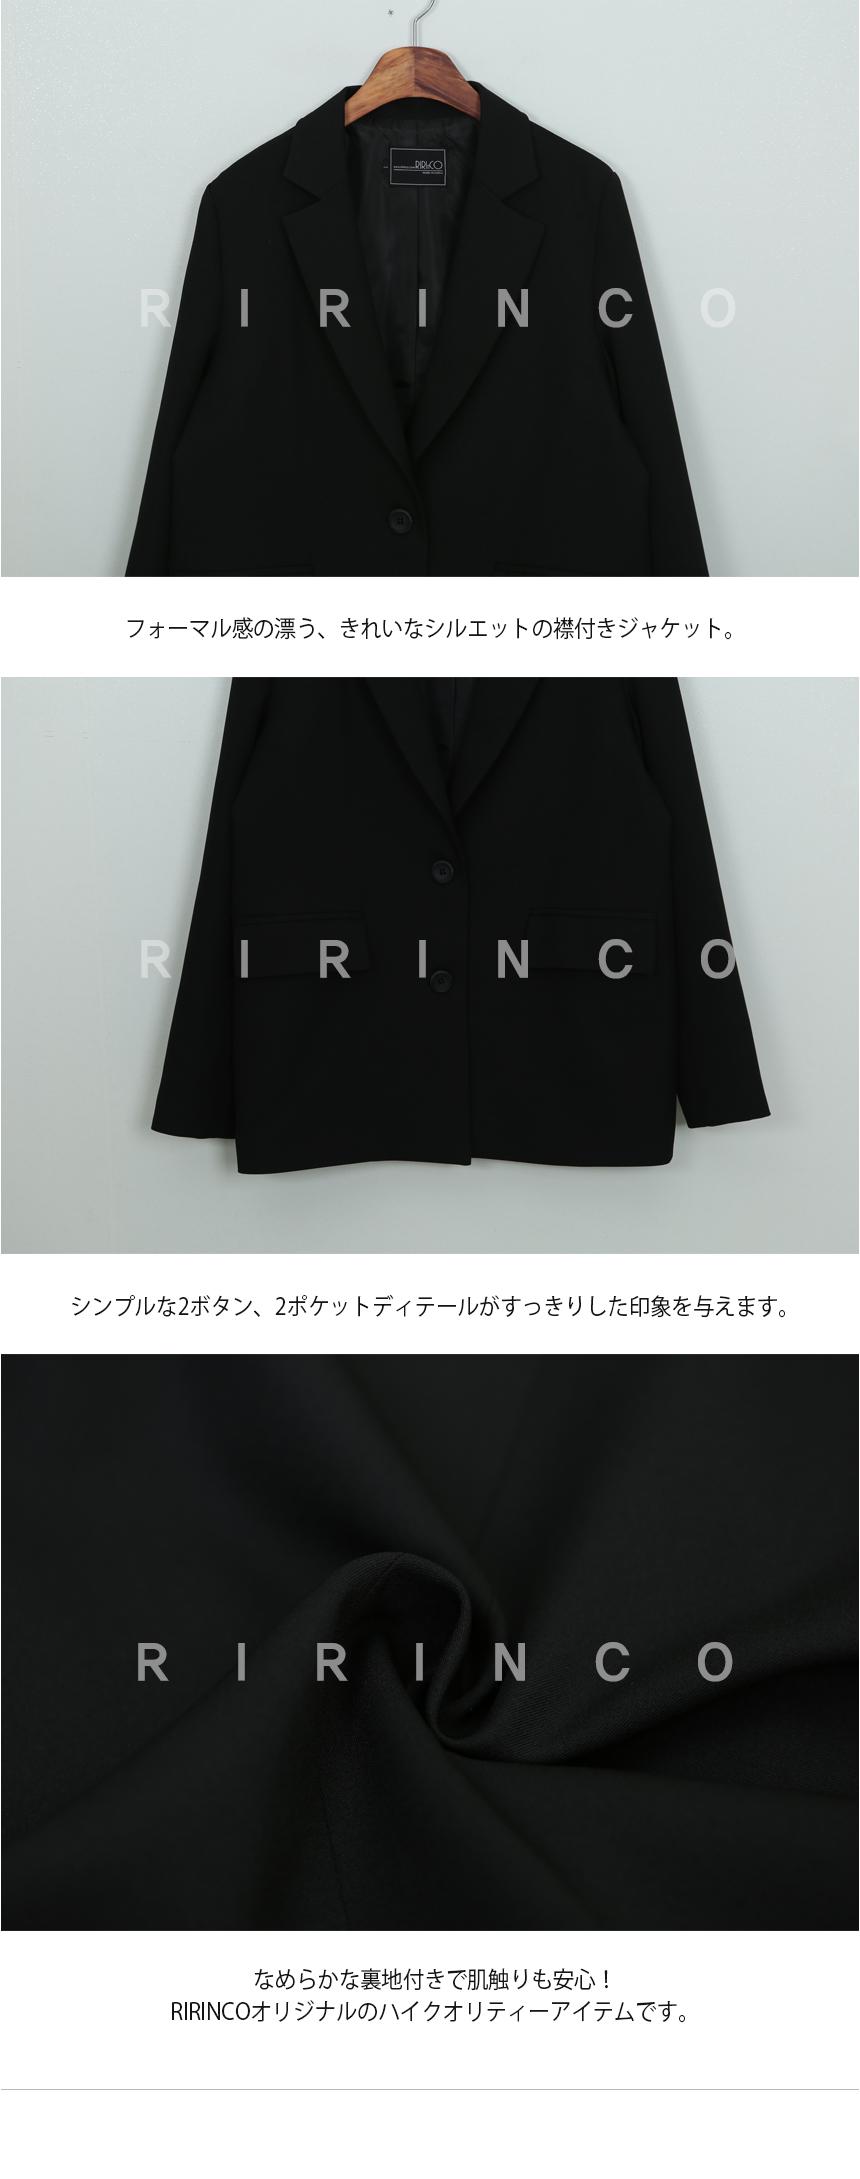 RIRINCO クラシックパンツ